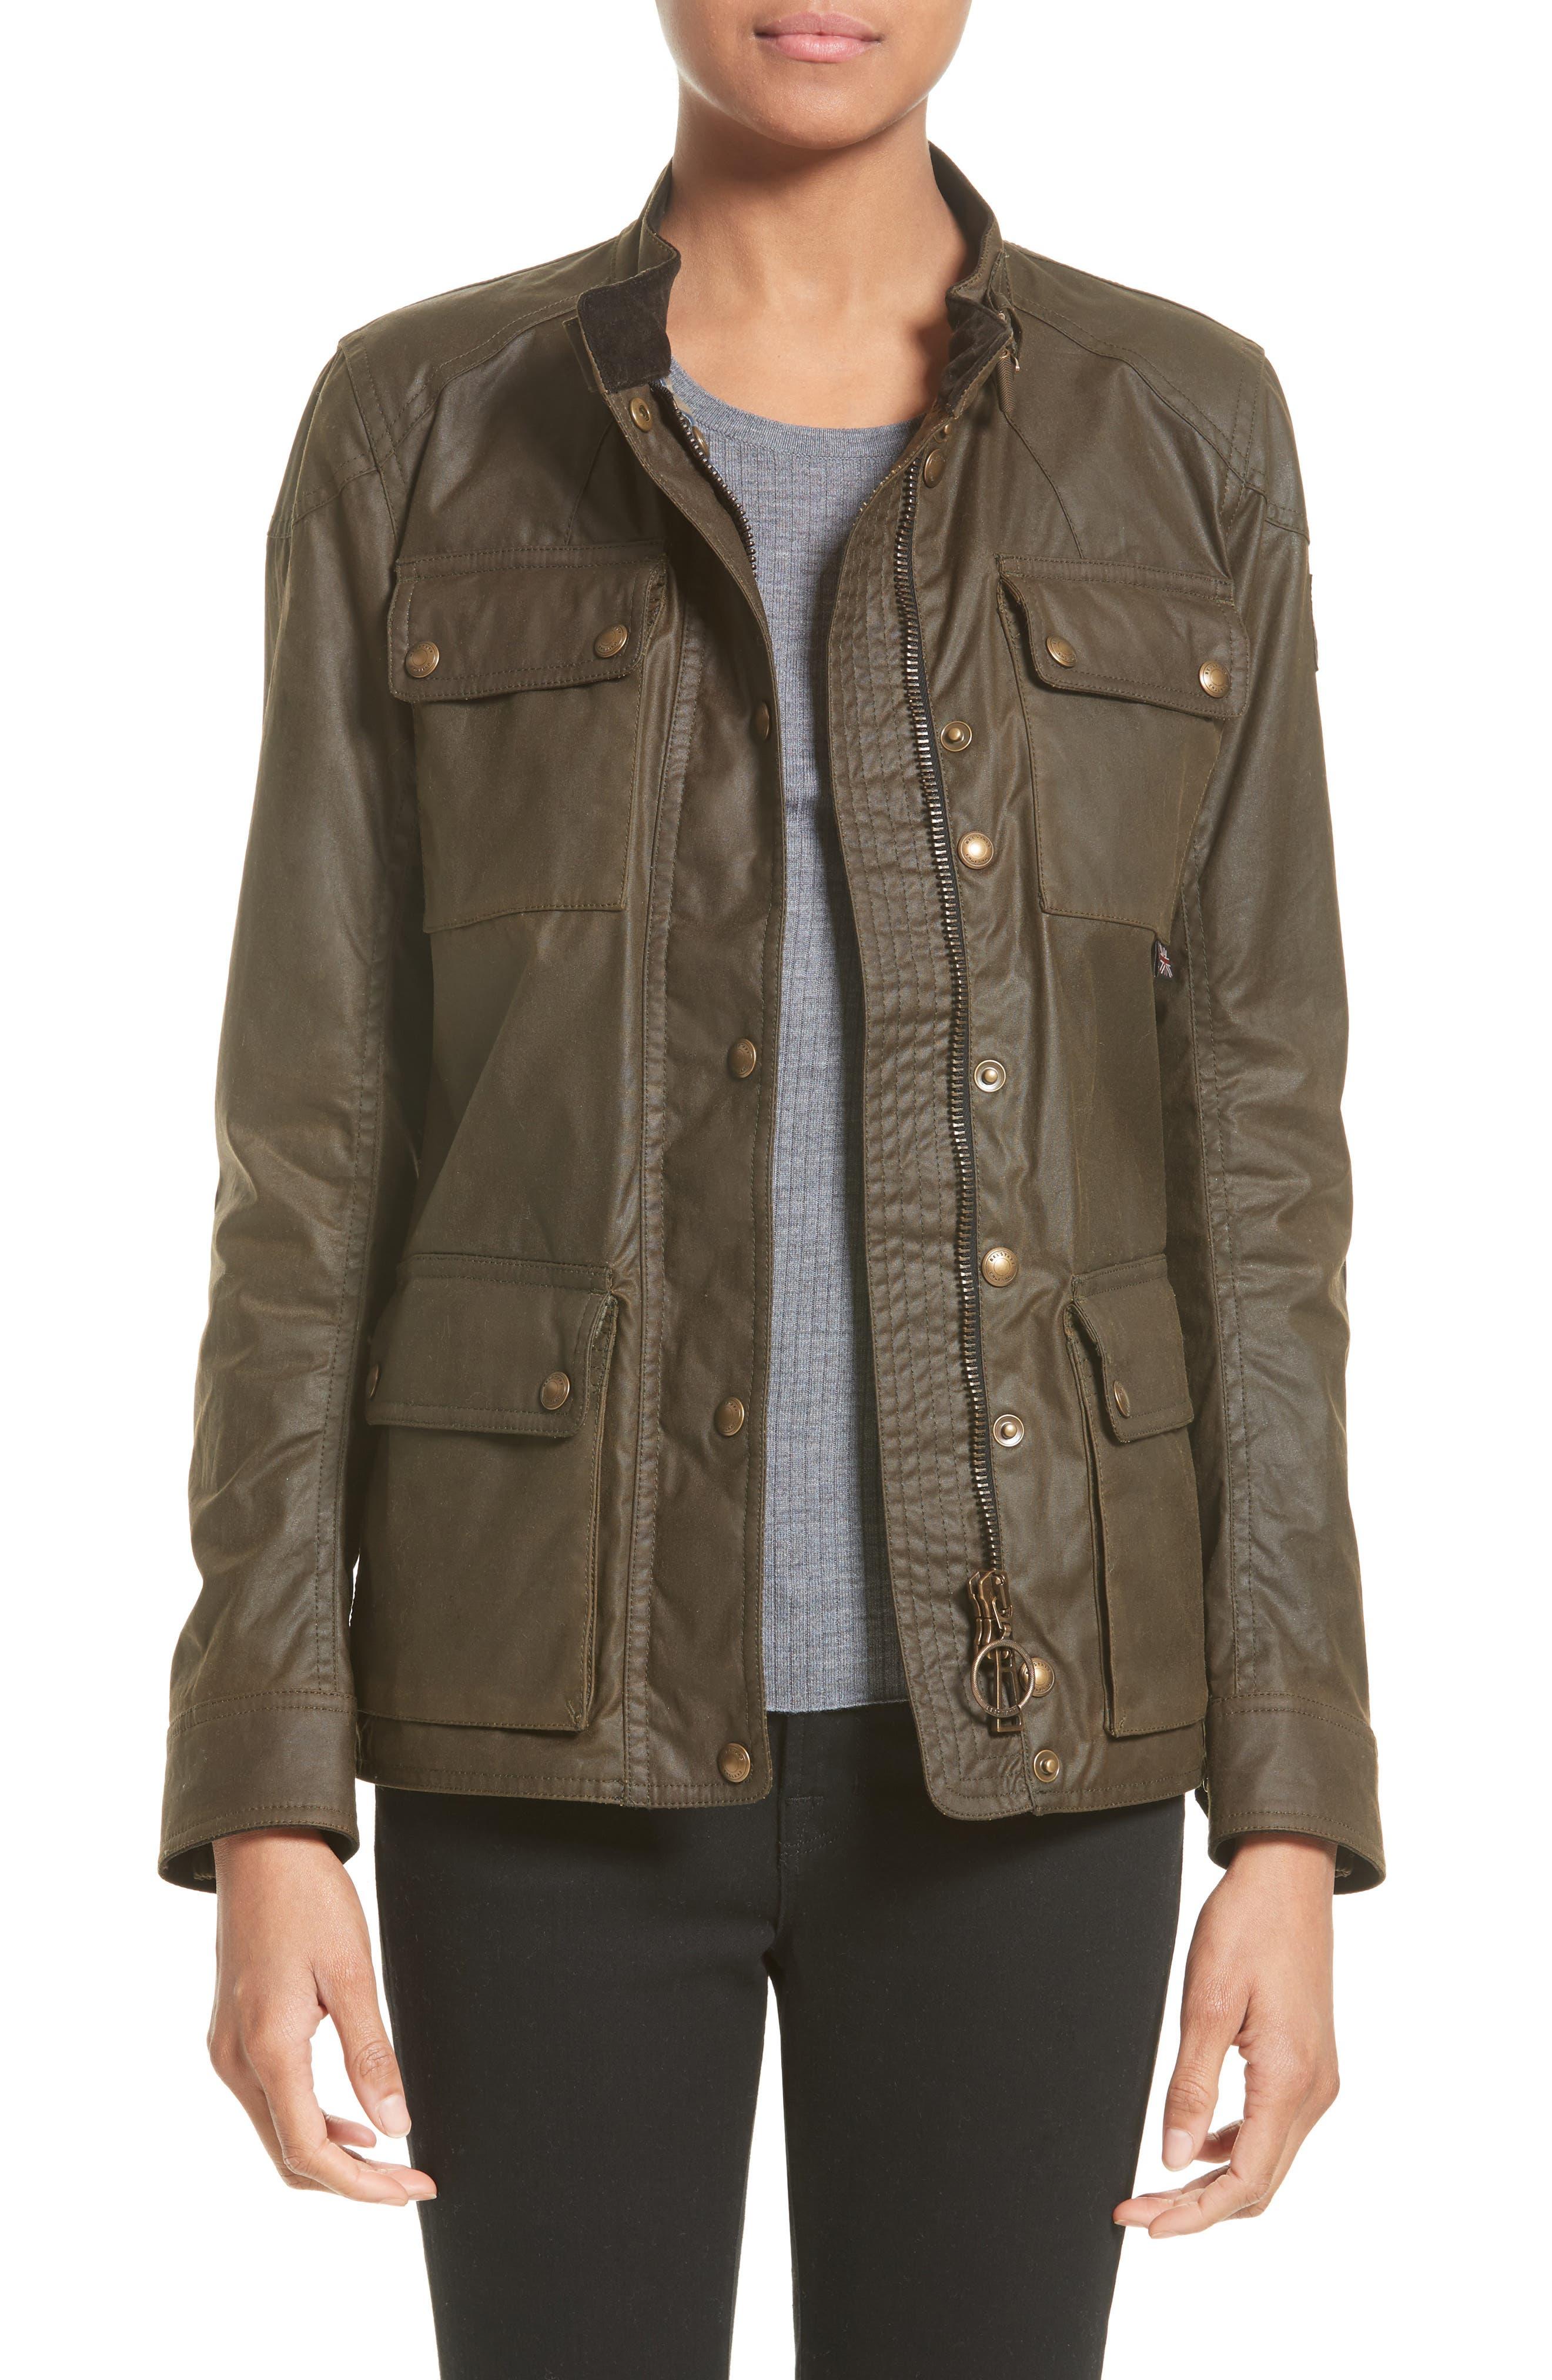 Military Jackets for Women | Nordstrom | Nordstrom